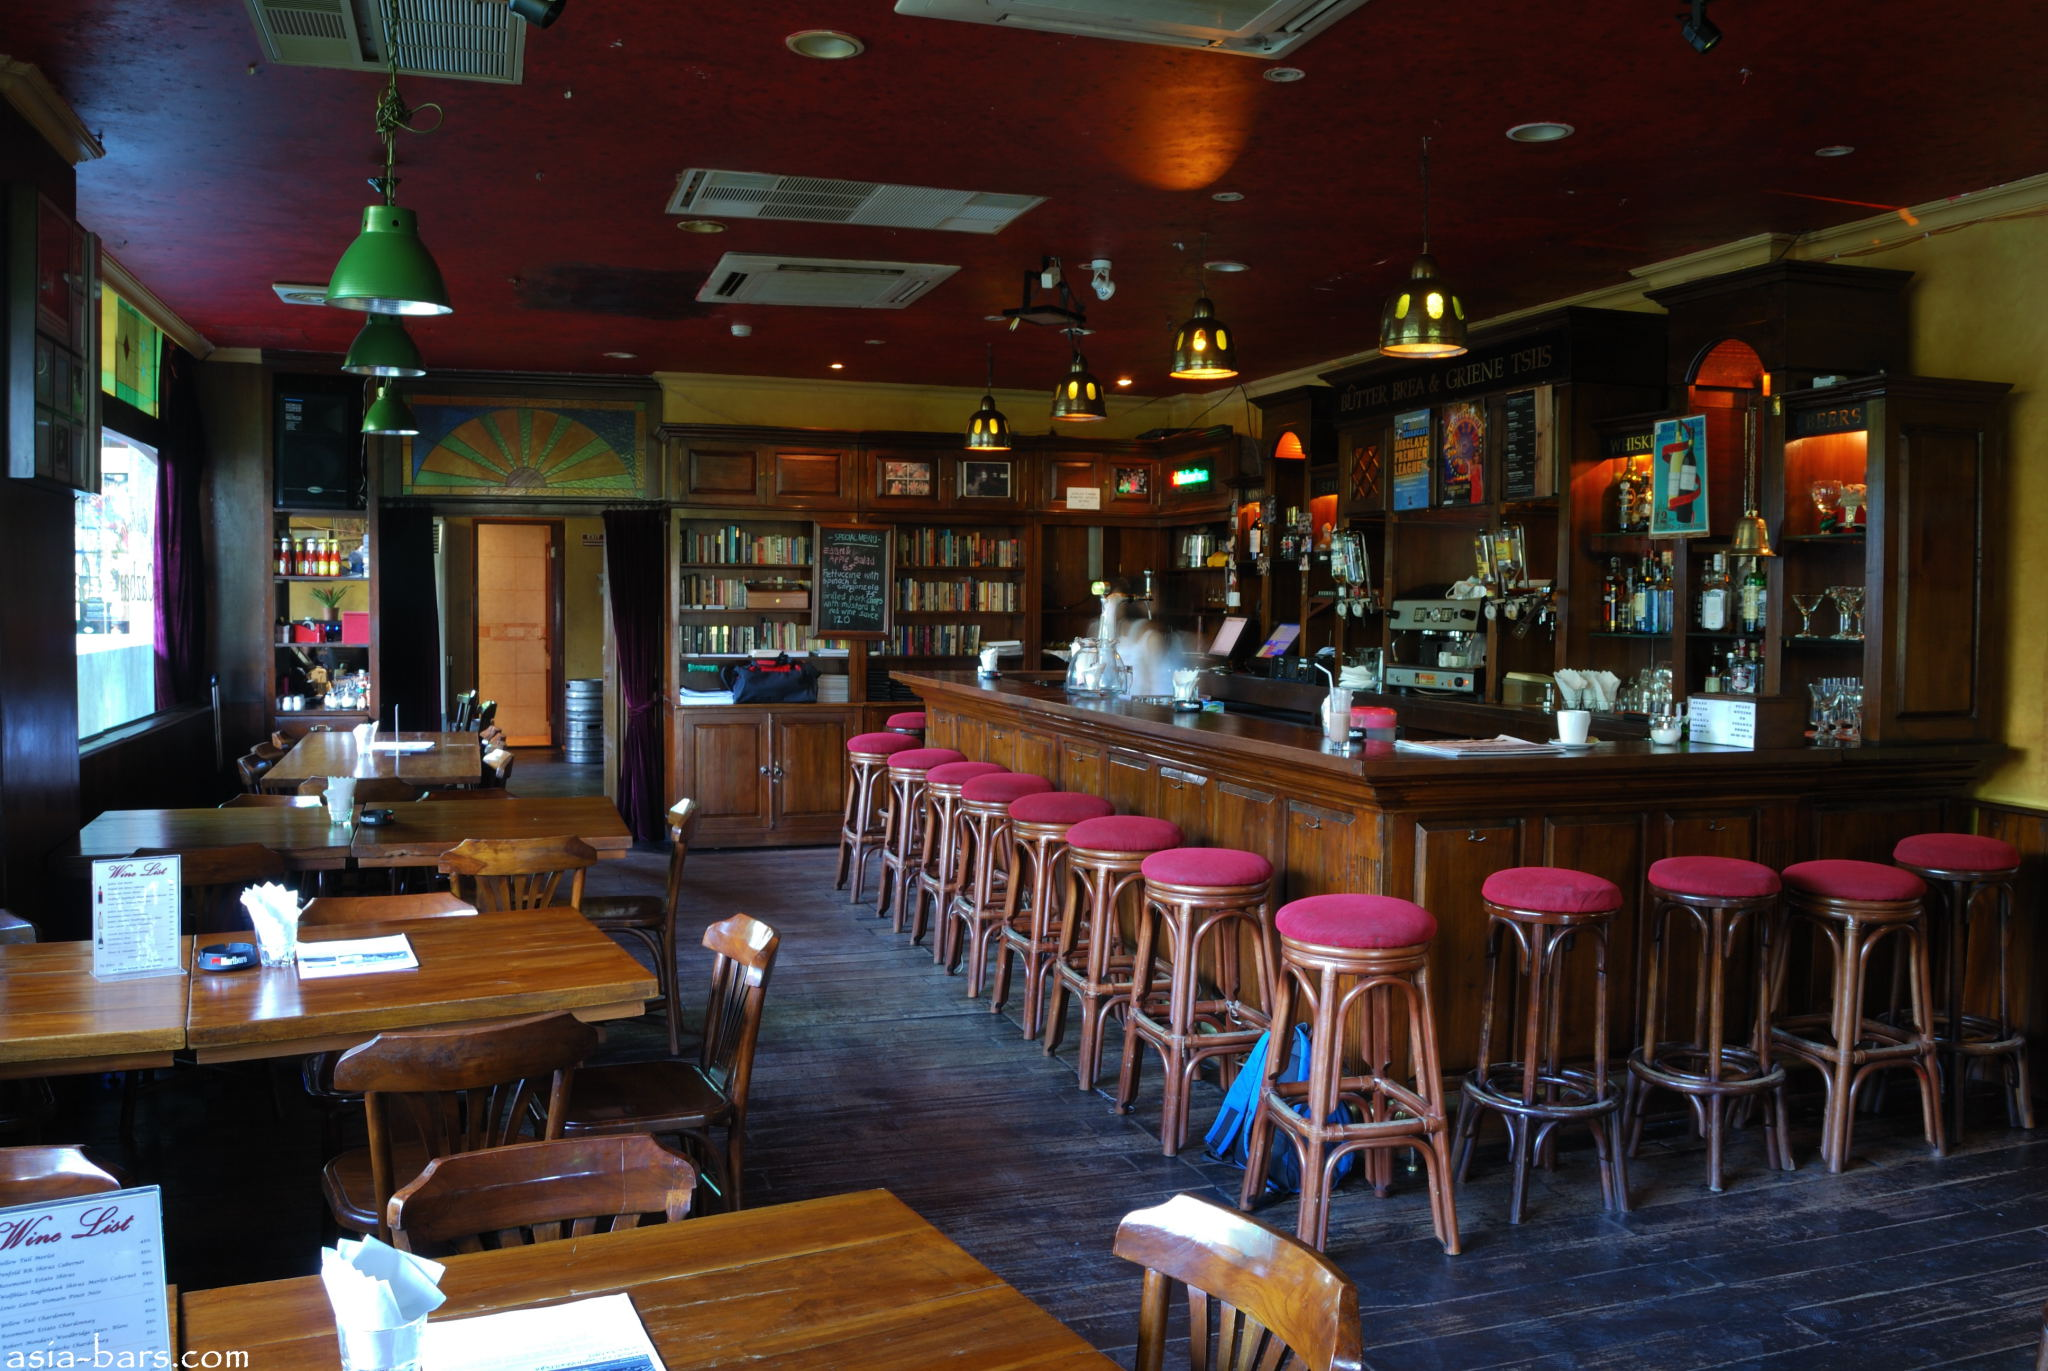 The Cazbar European Style Cafe Amp Sports Bar In Central Jakarta Asia Bars Amp Restaurants